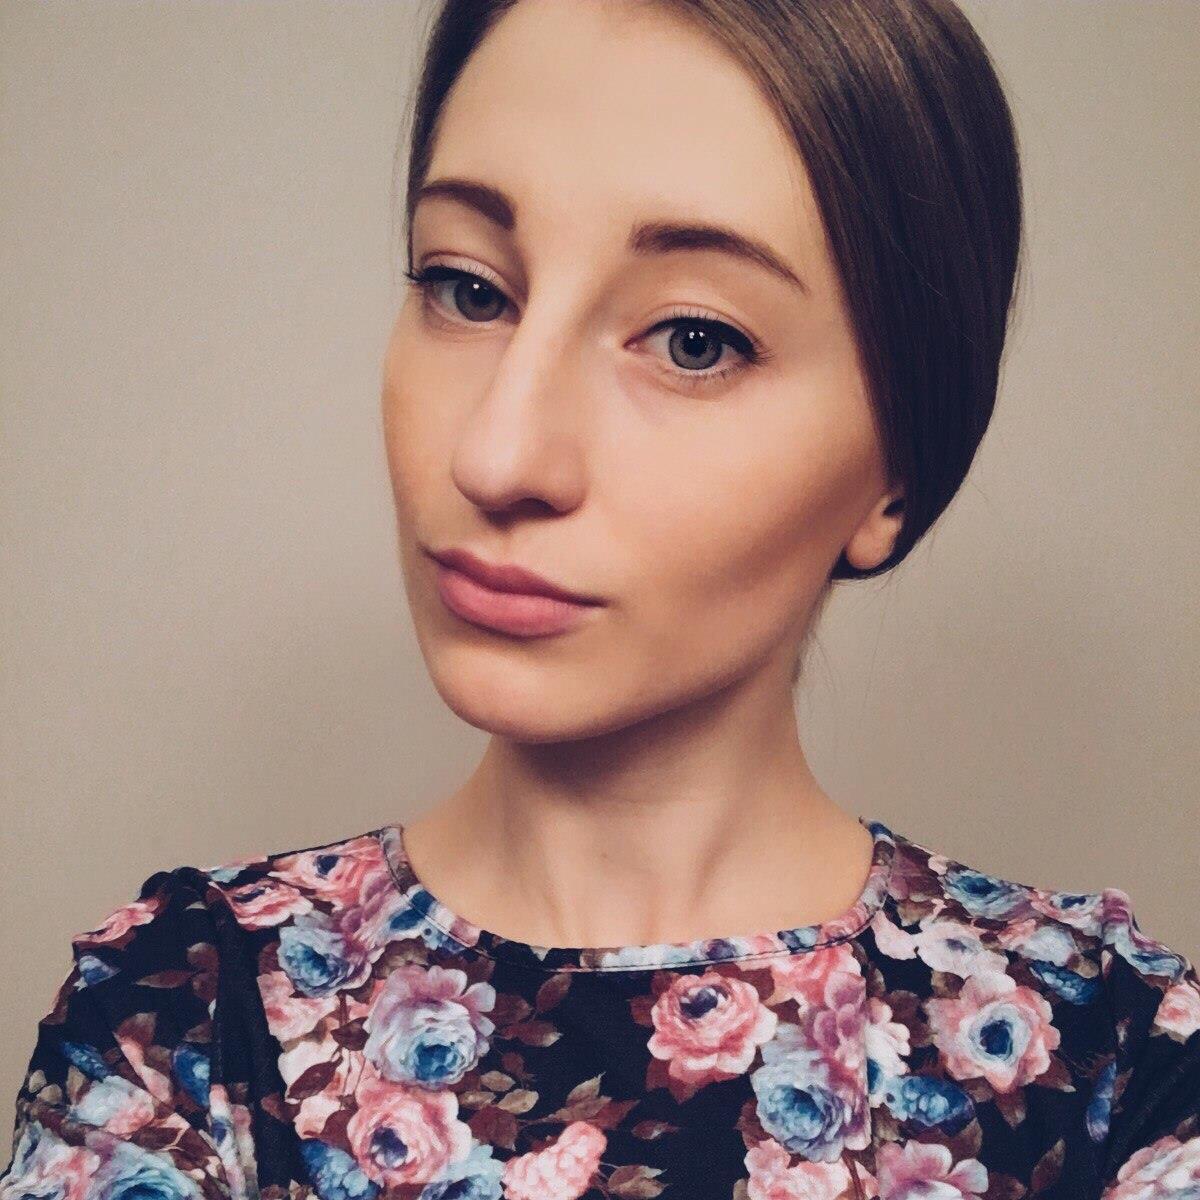 Maria Katkova